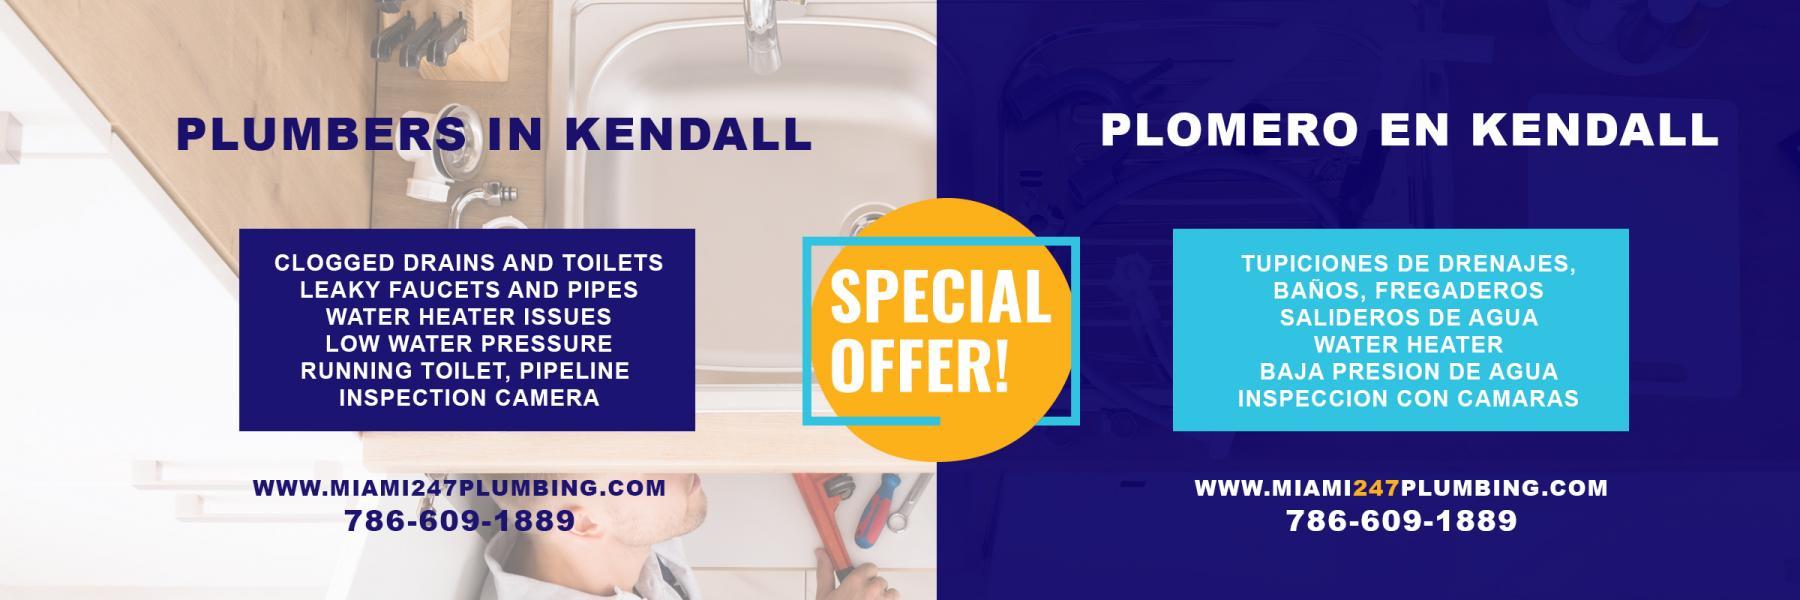 Miami 24/7 Plumbing - Plomero en Kendall